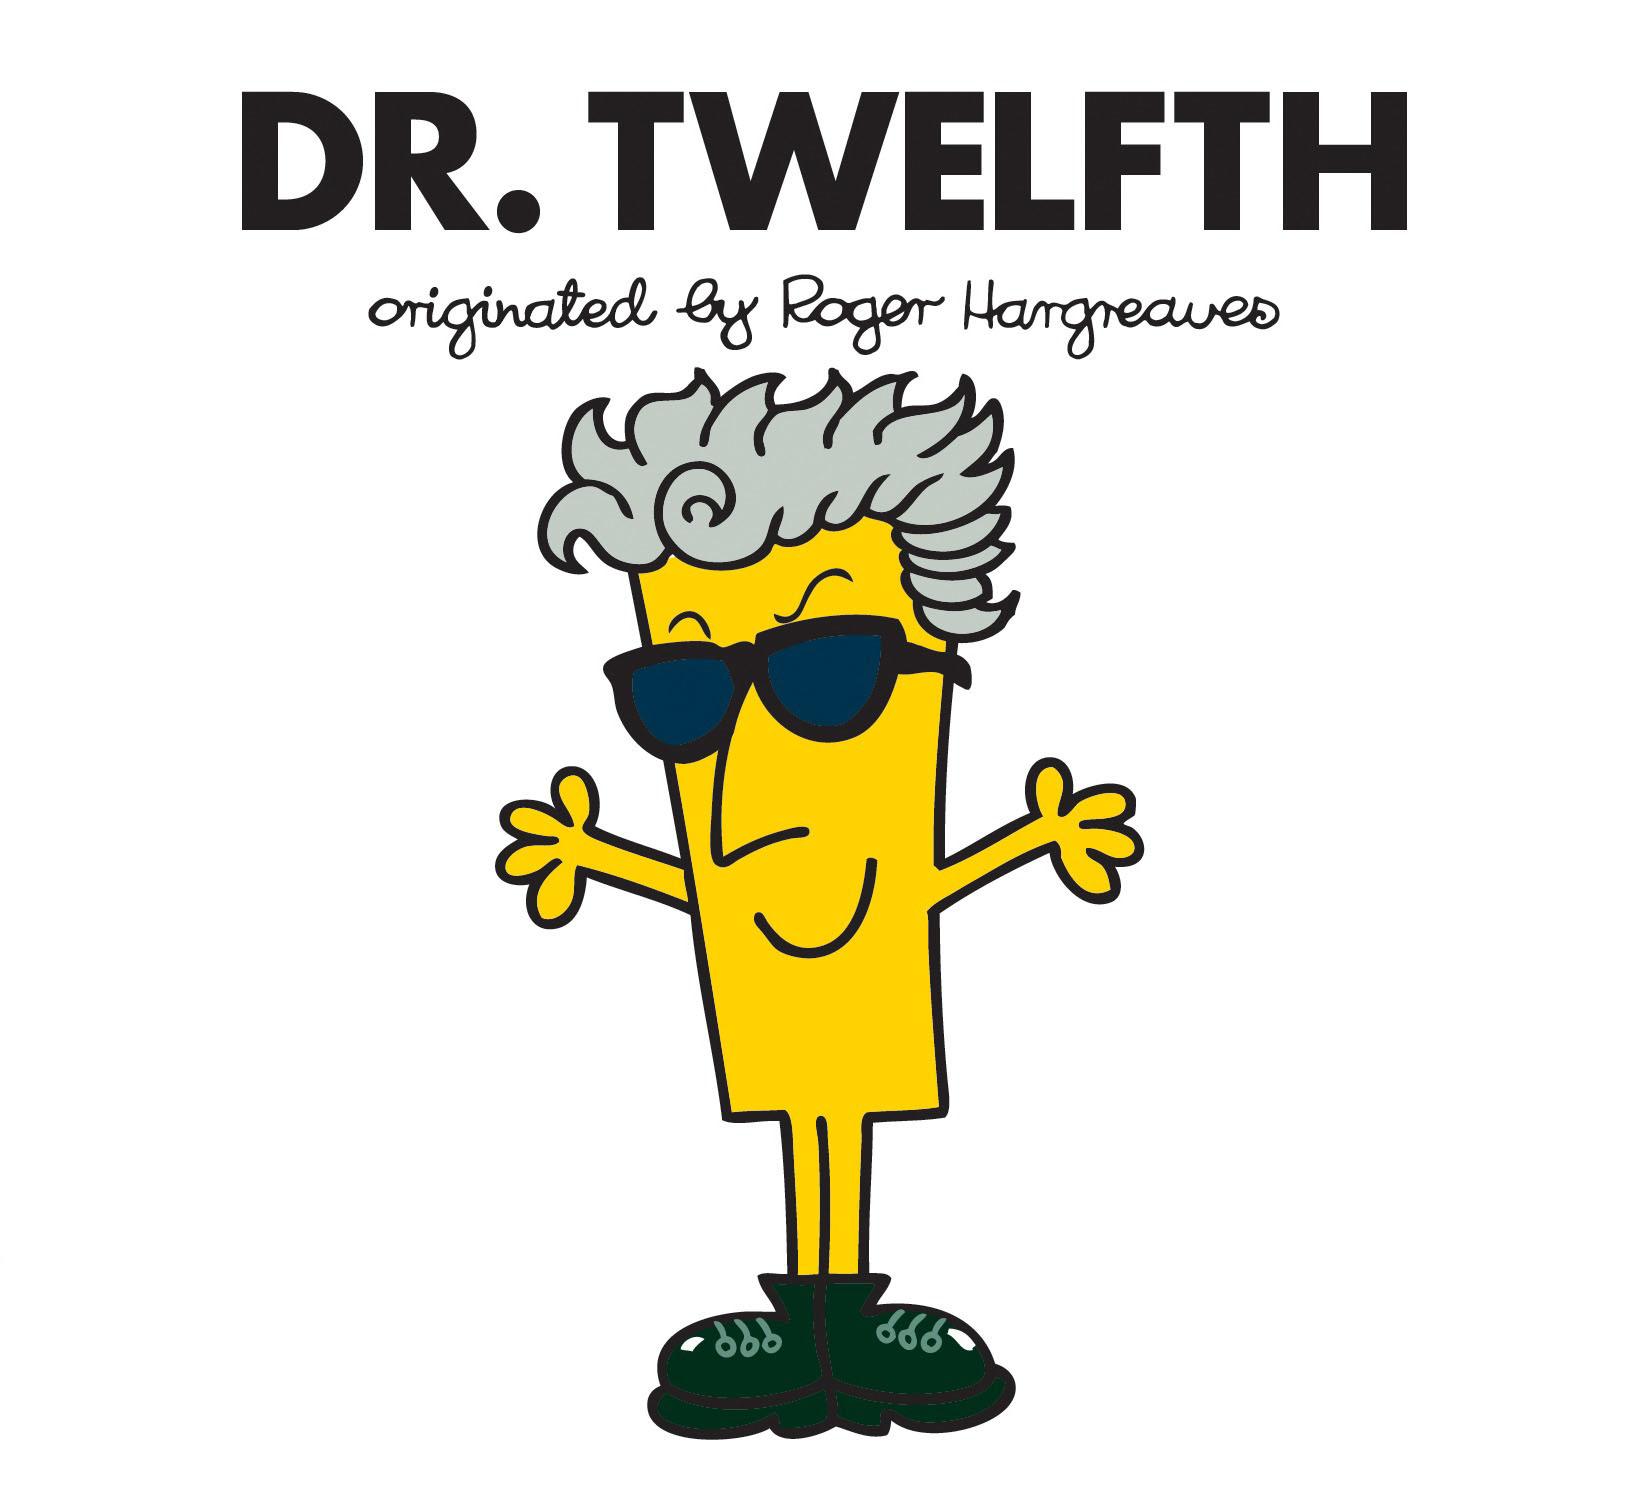 Dr. Twelfth doctor who dr twelfth roger hargreaves